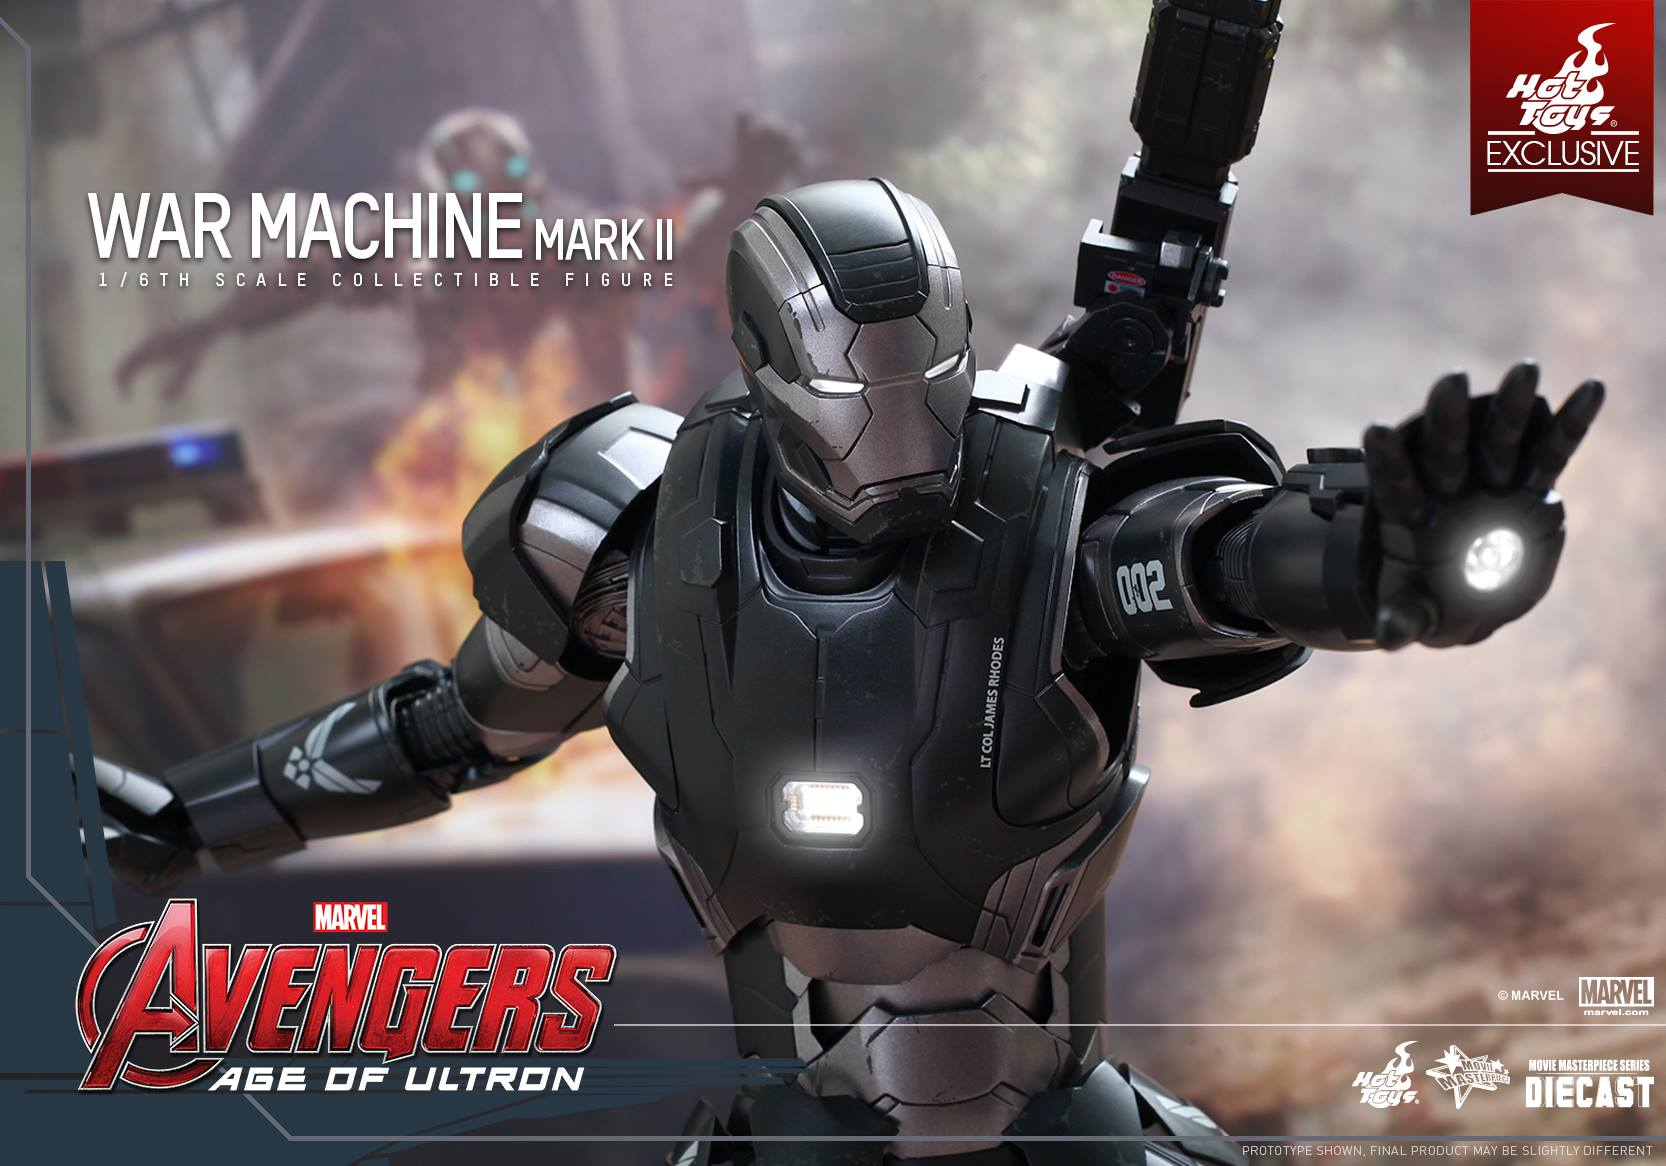 Hot Toys Avengers Age of Ultron War Machine -wide shot